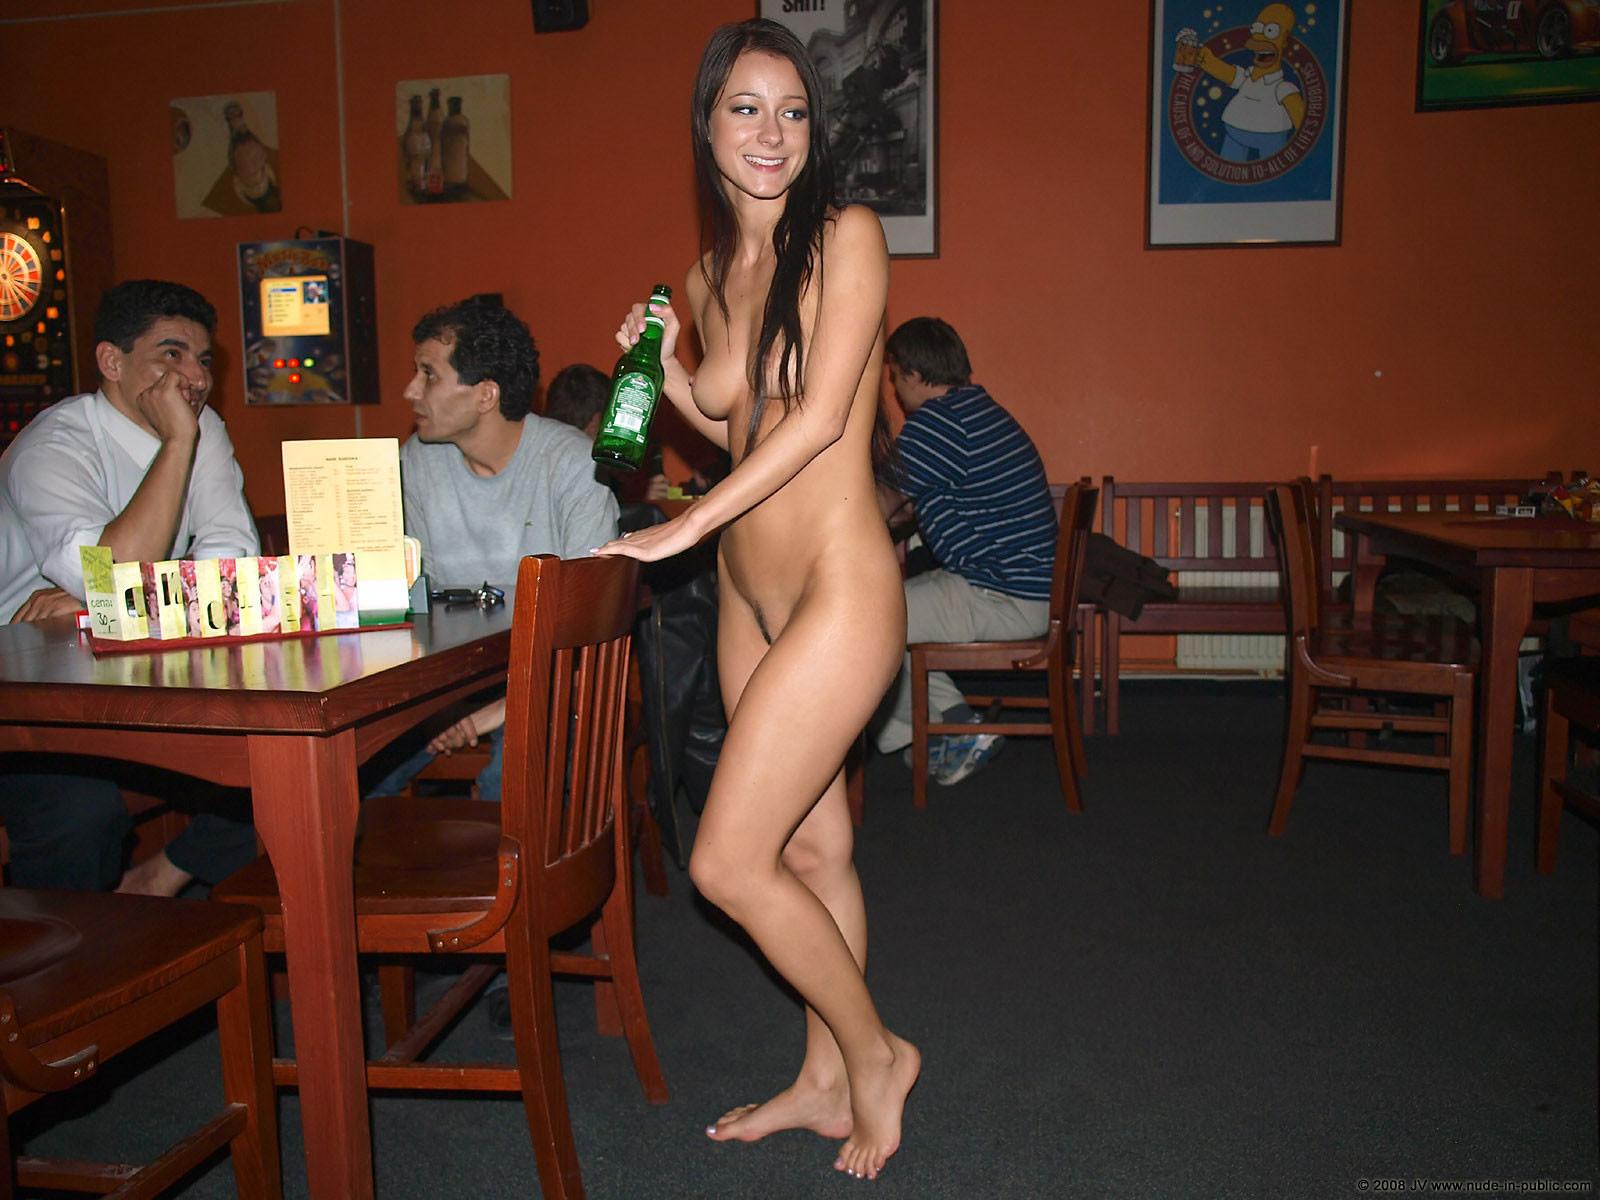 melisa-pub-beer-bar-girl-nude-in-public-61